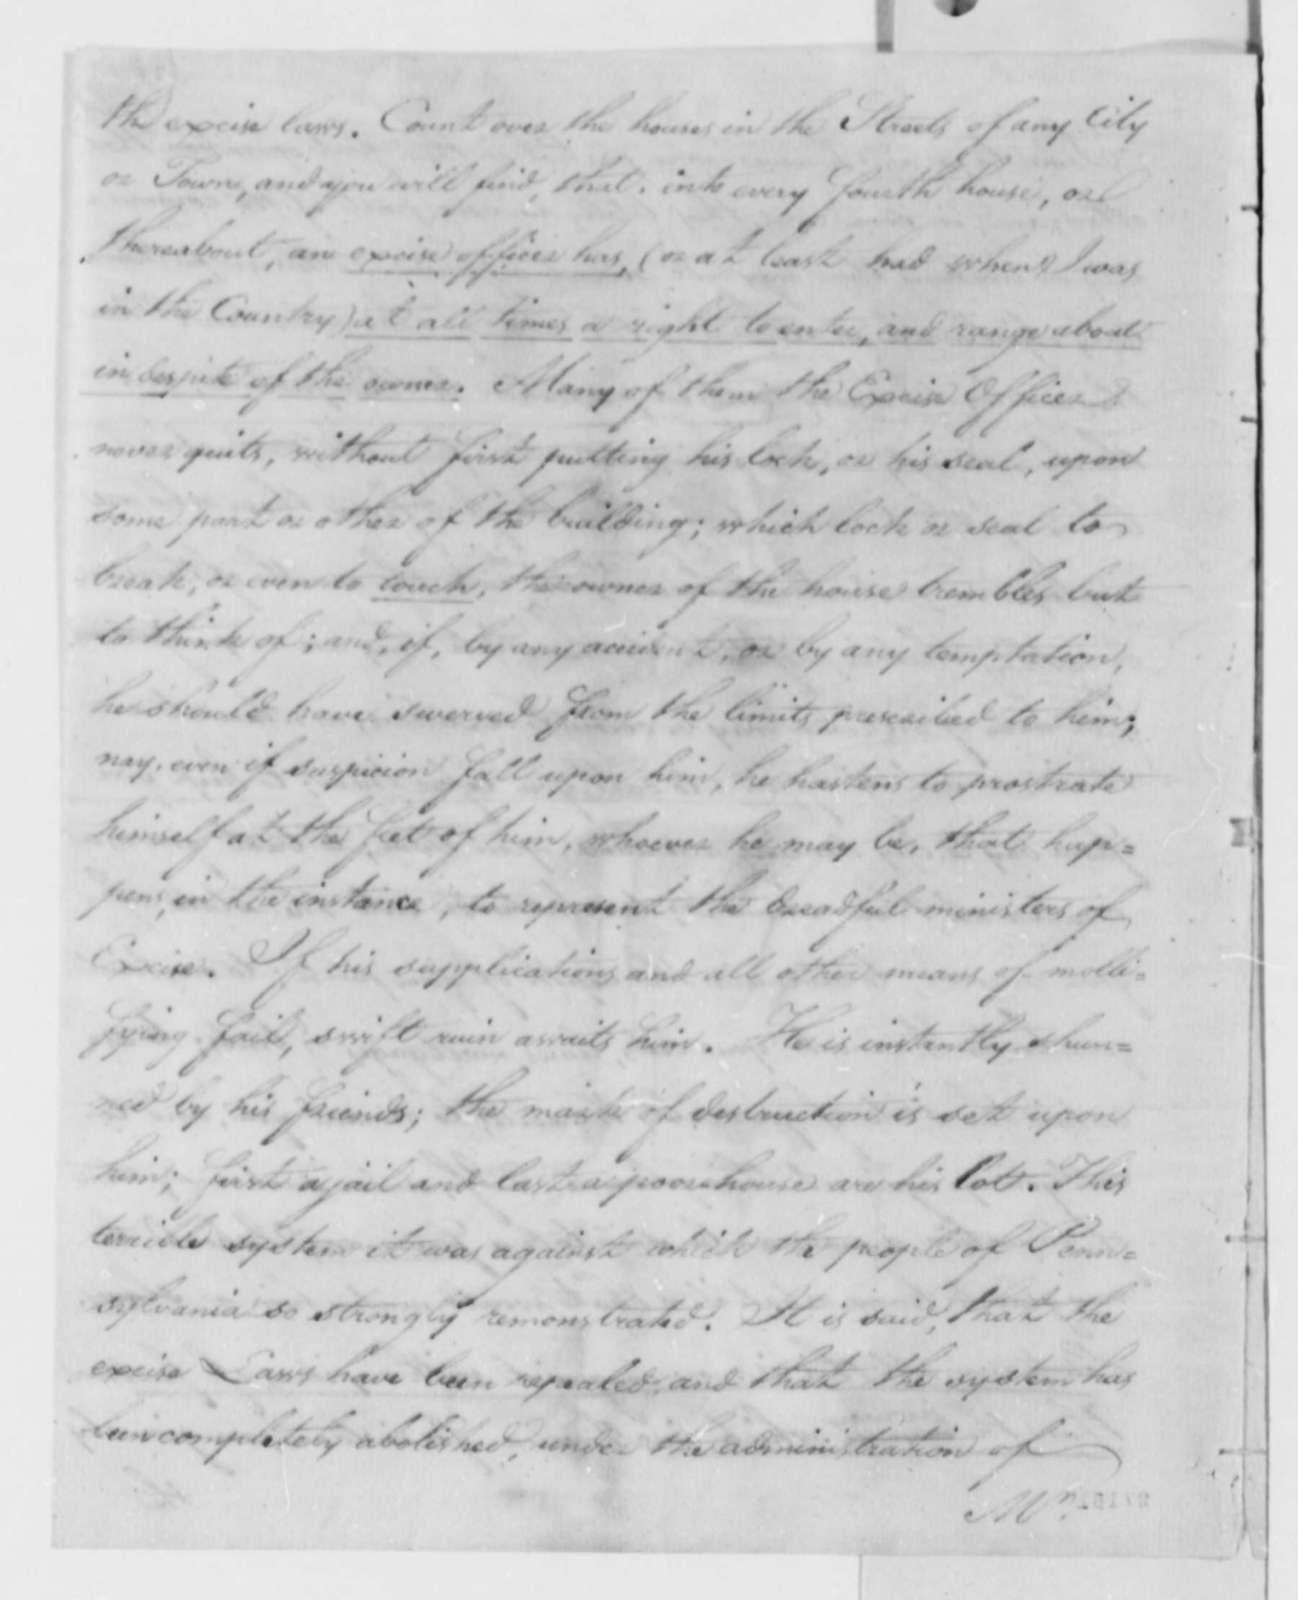 Charles Pinckney to Thomas Jefferson, March 1805